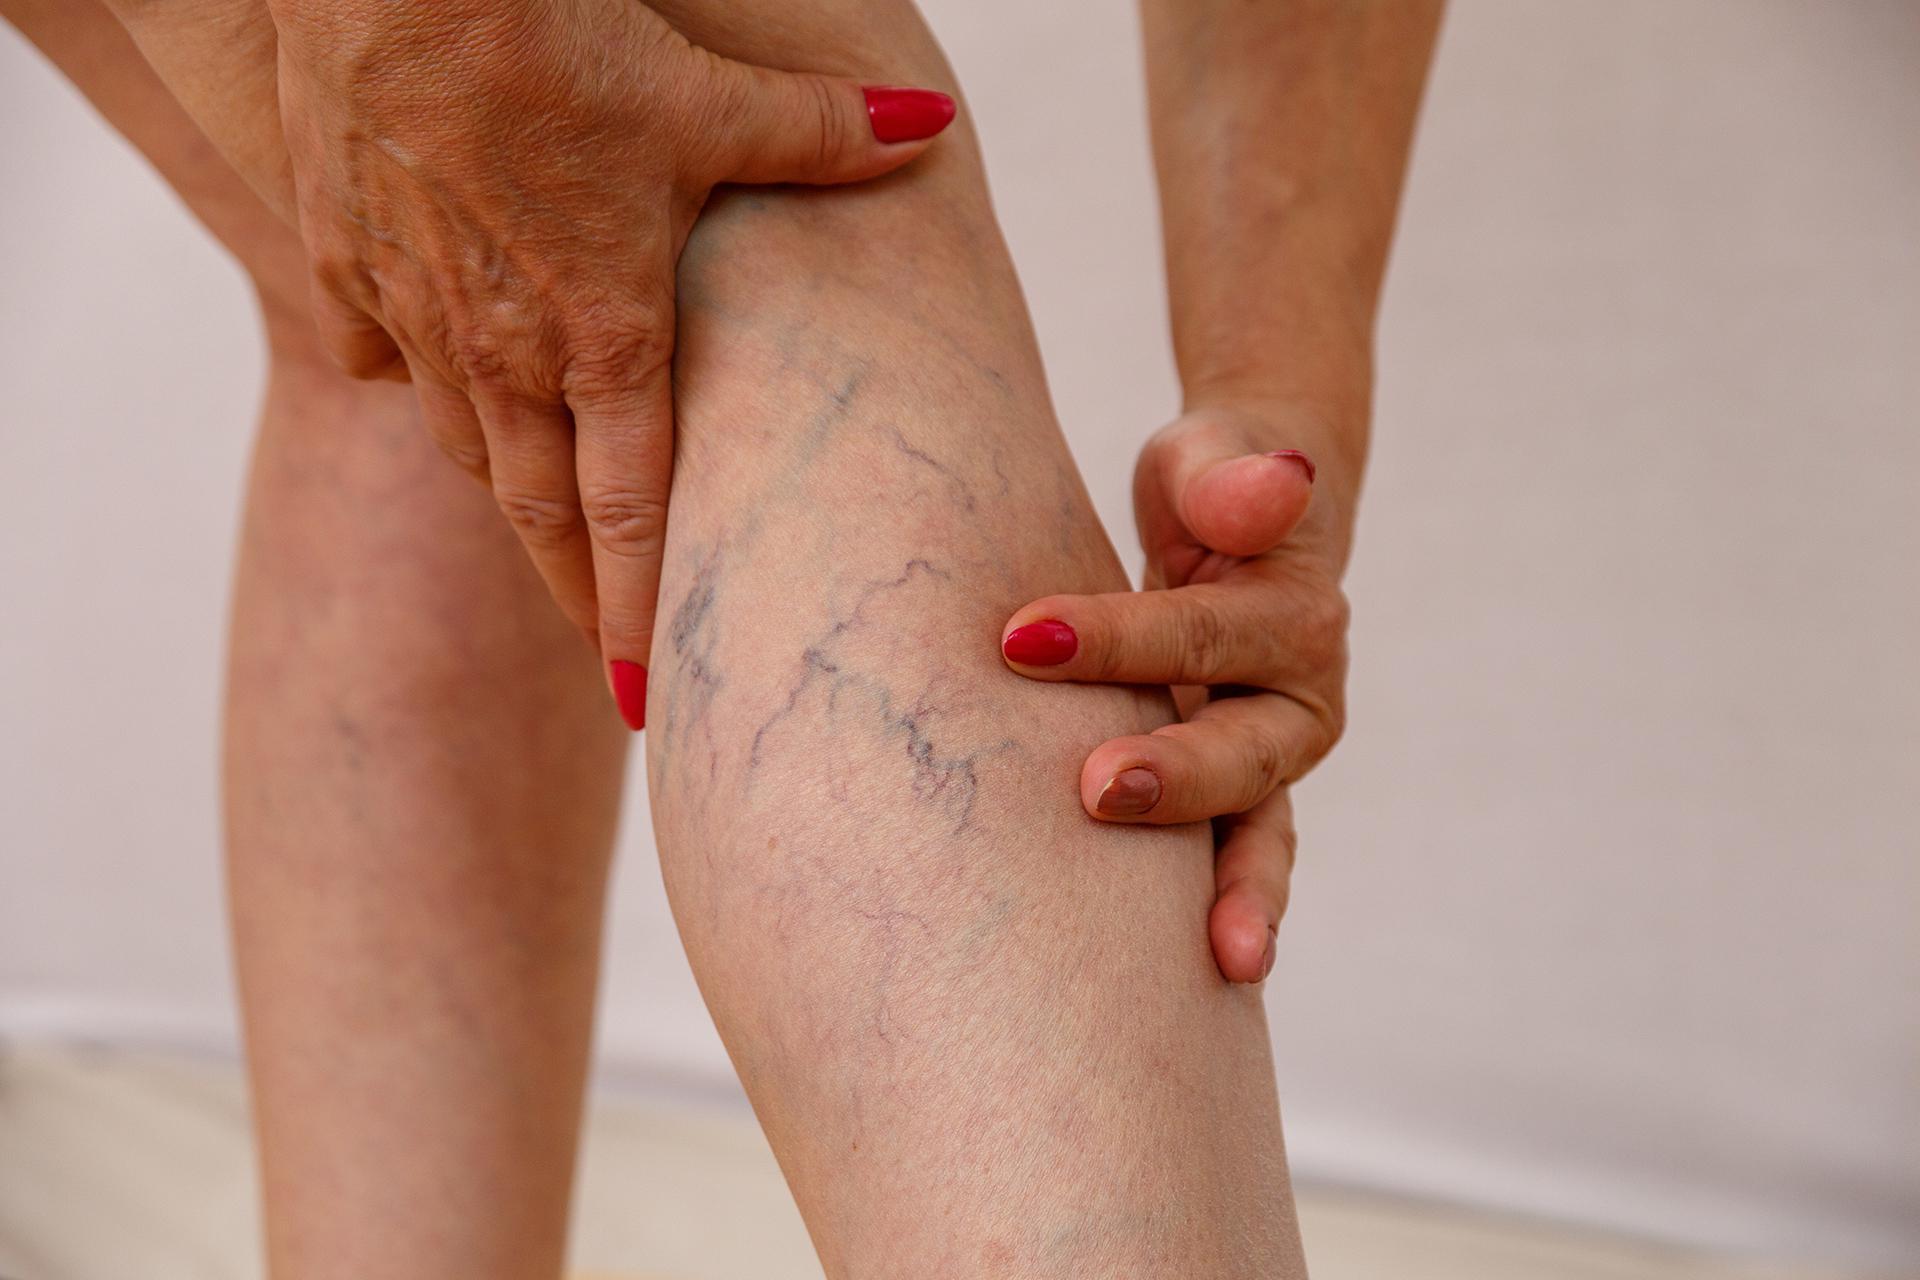 vascular-issues-requiring-leg-pain-doctor-Pasadena